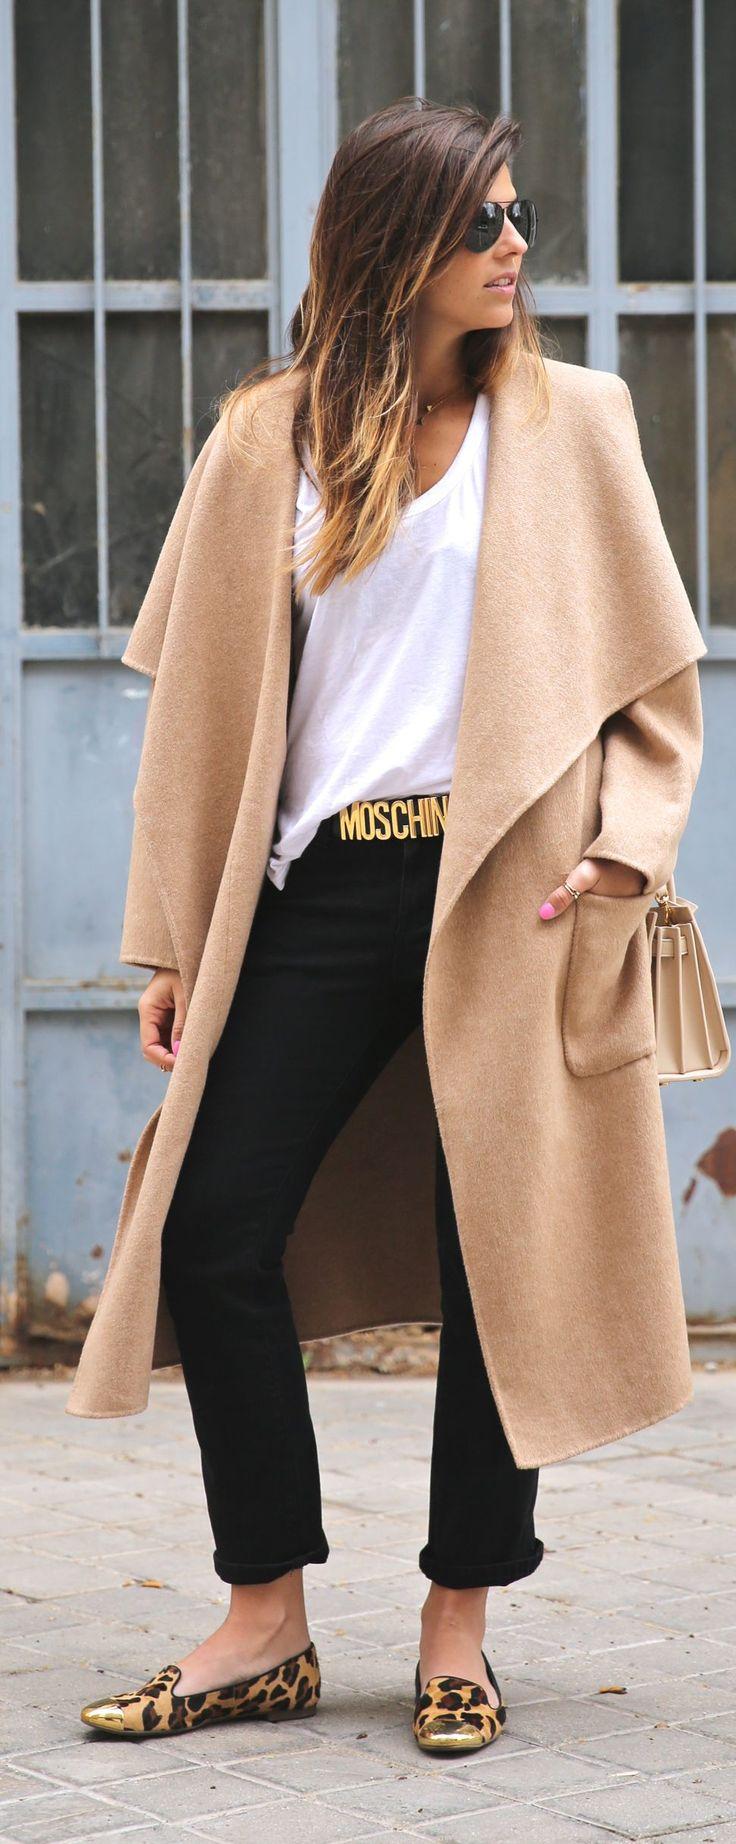 #street #style camel coat + Moschino belt / casual @wachabuy